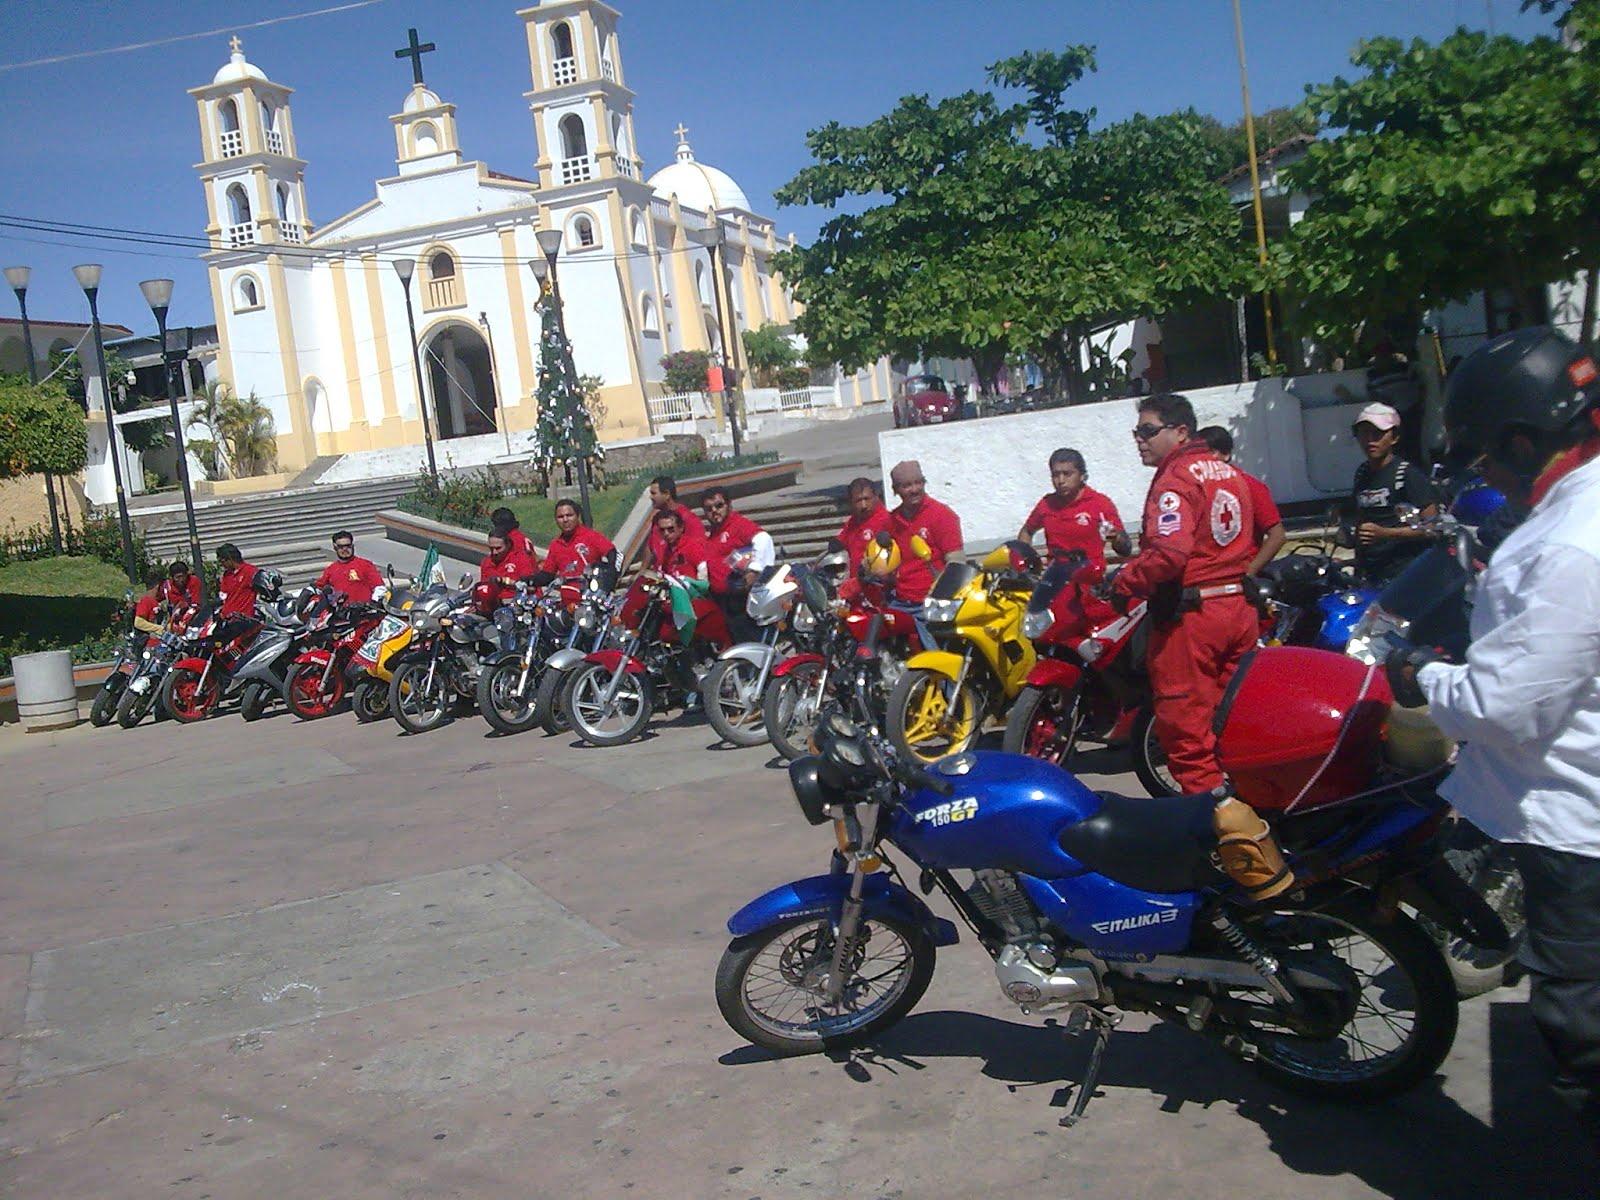 Moto Club 12 de Diciembre